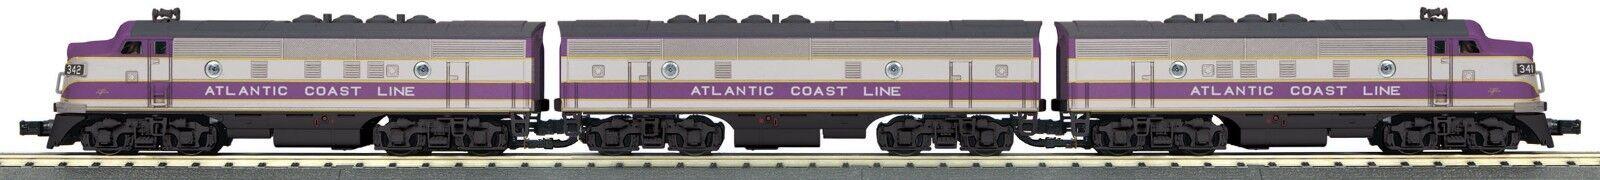 MTH 30-20463-1 30-20463-1 30-20463-1 ATLANTIC COAST LINE  F3 A-B-A   RAILKING SCALE  PredO 3.0 SMOKE d88580